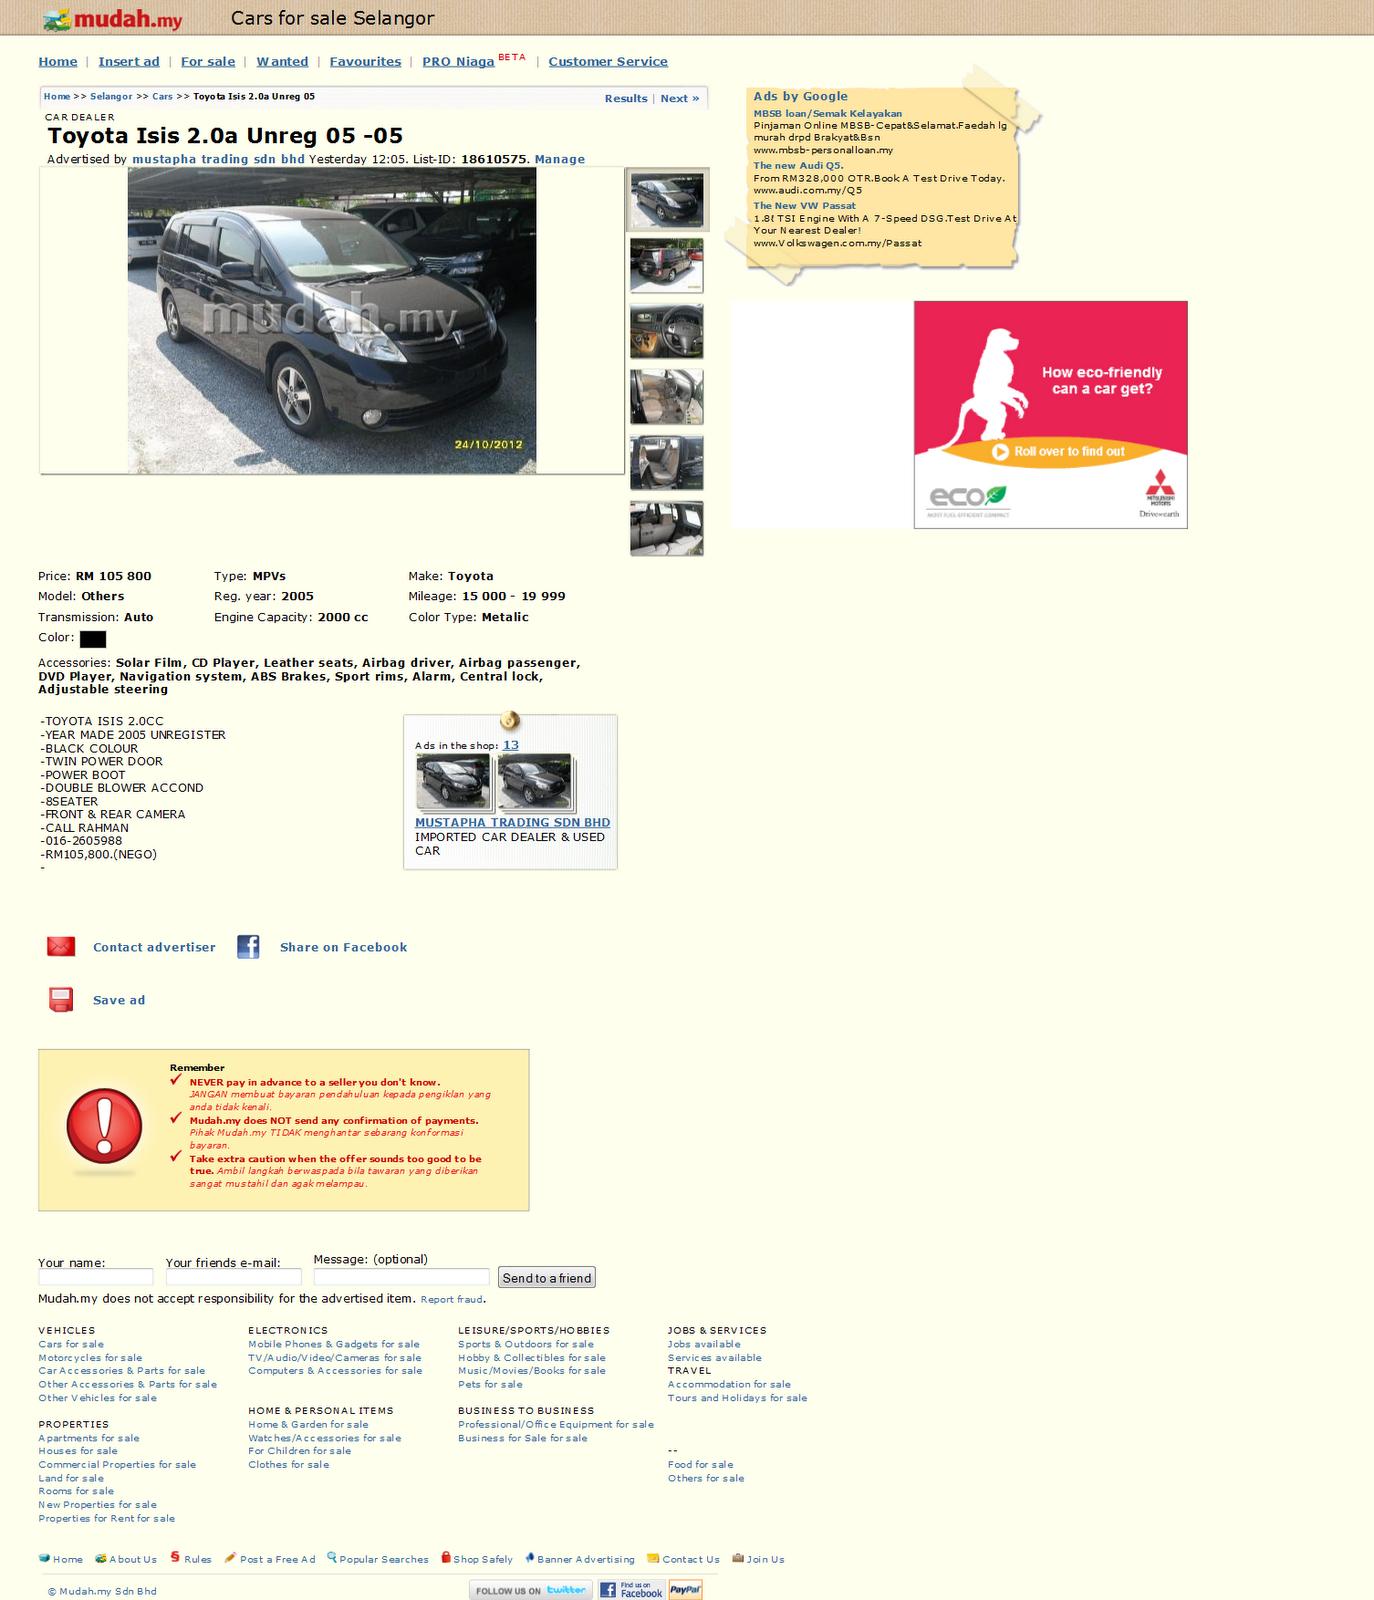 Mudah.my Malaysia Sale Car